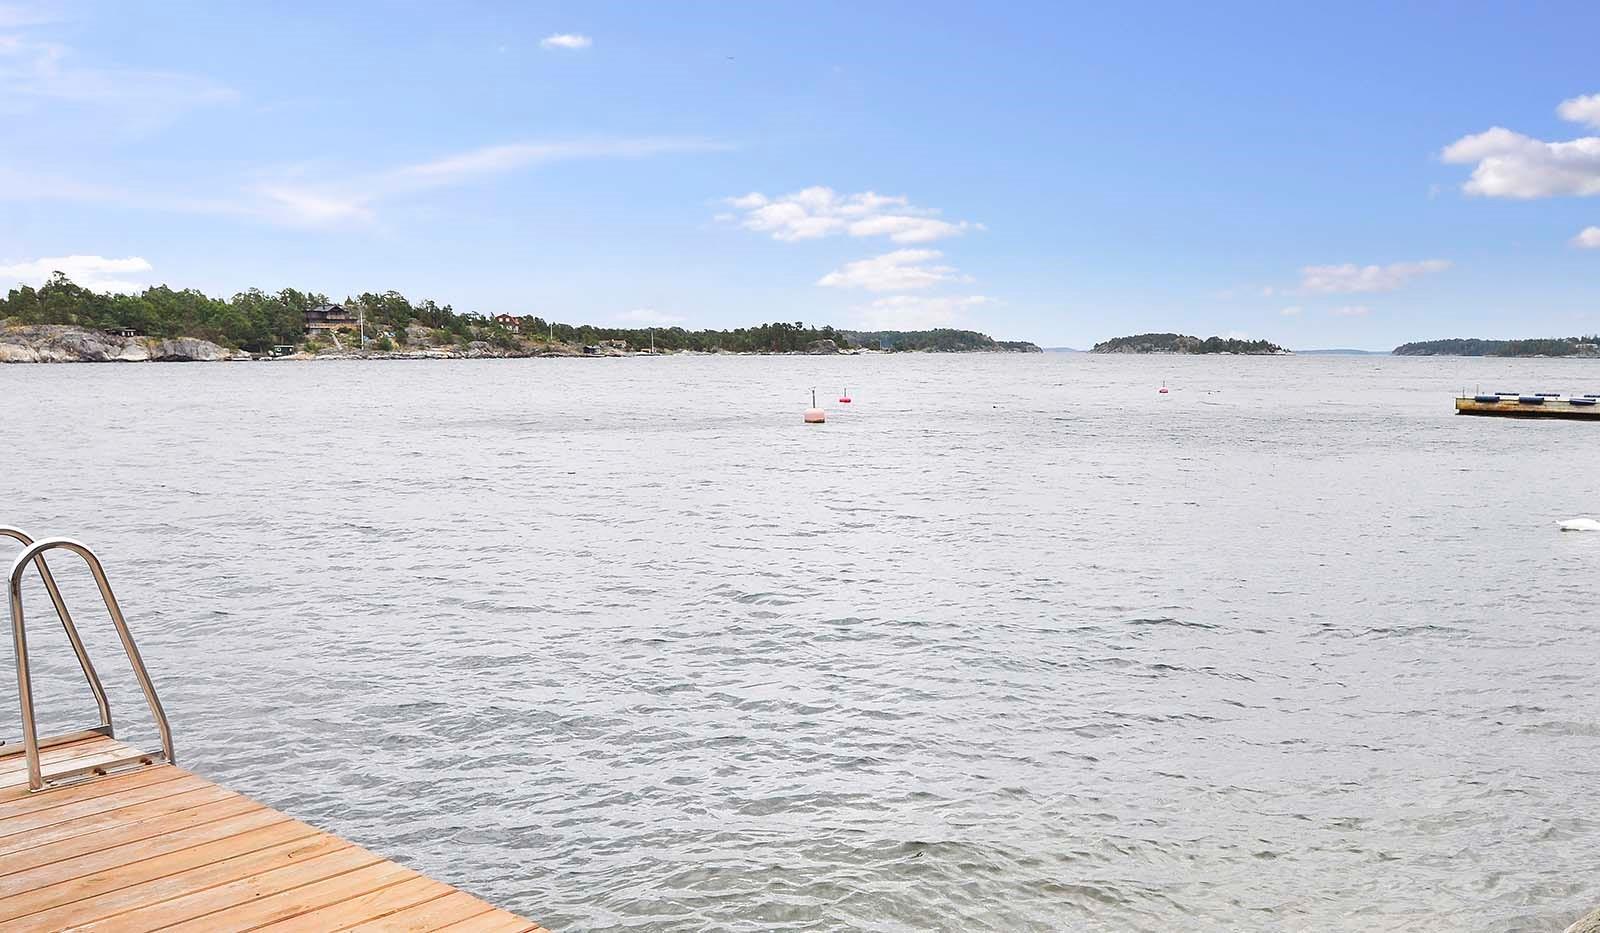 Smådalarö/ Kalvholmen/Gränö - Från bryggan